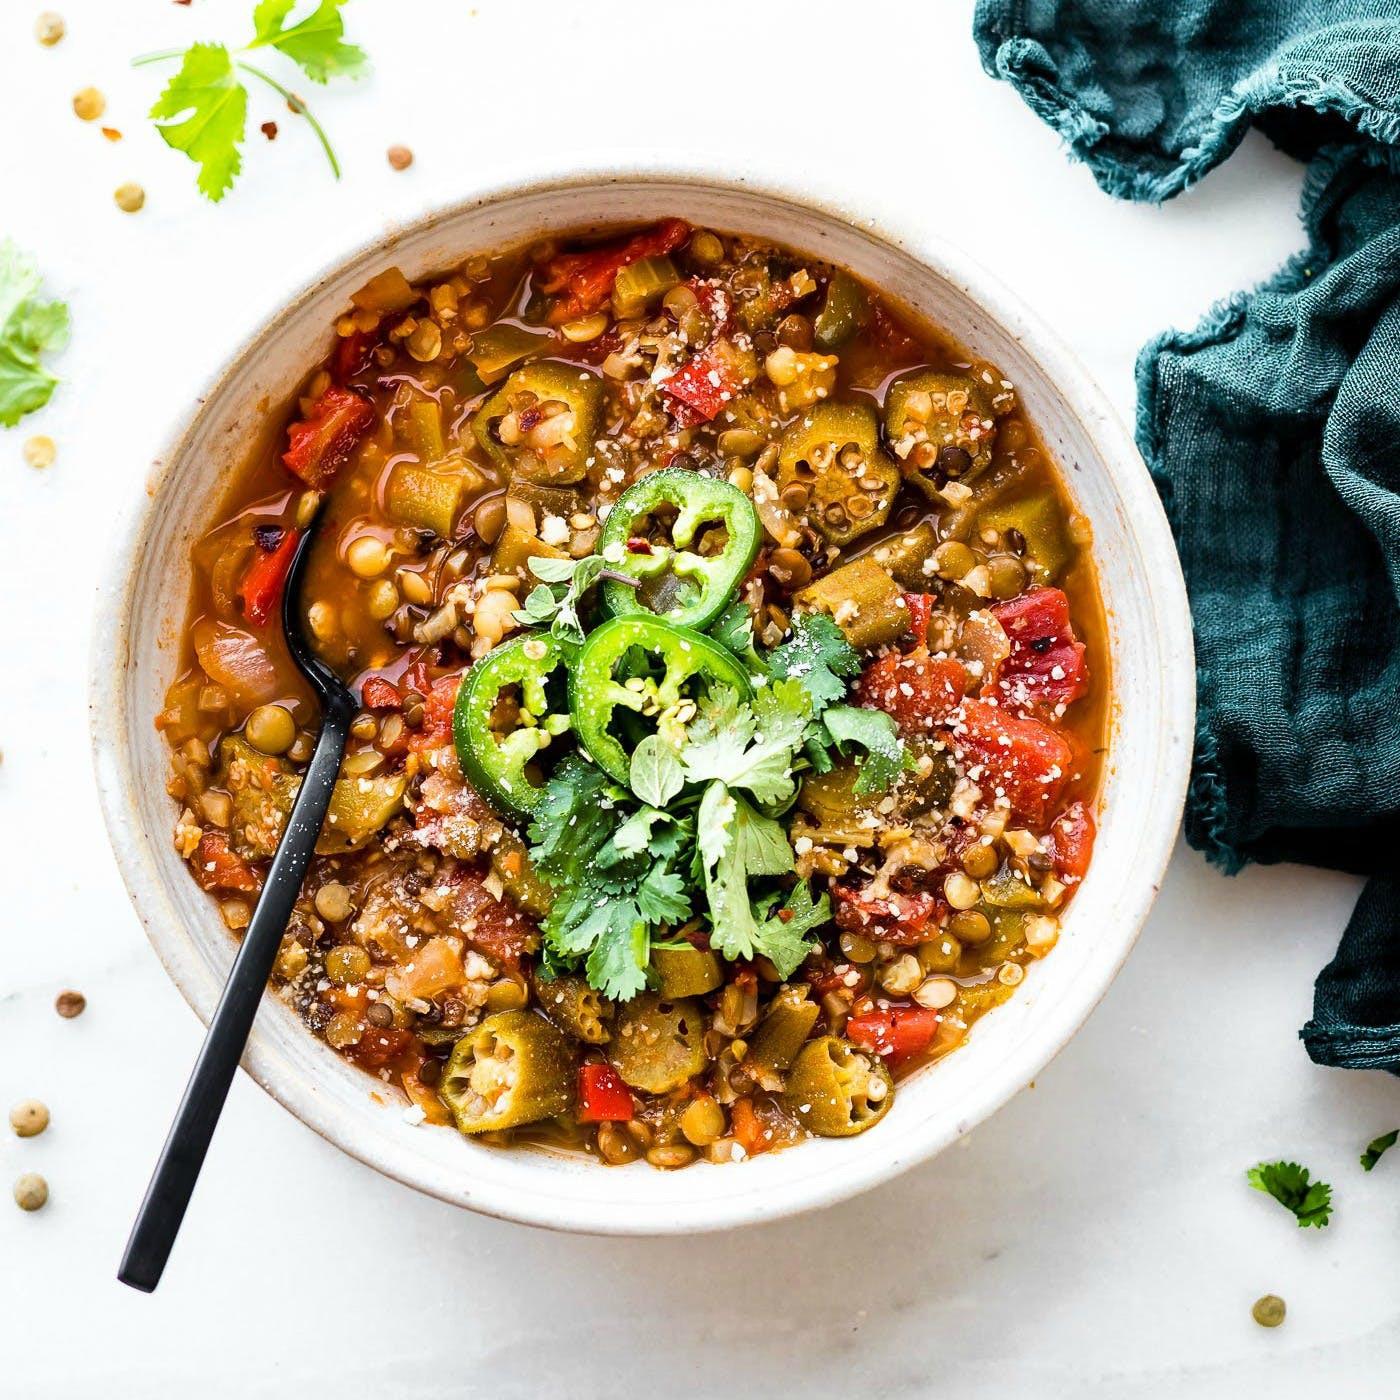 Vegan Instant Pot Recipes  Easy Weeknight Vegan Instant Pot Recipes